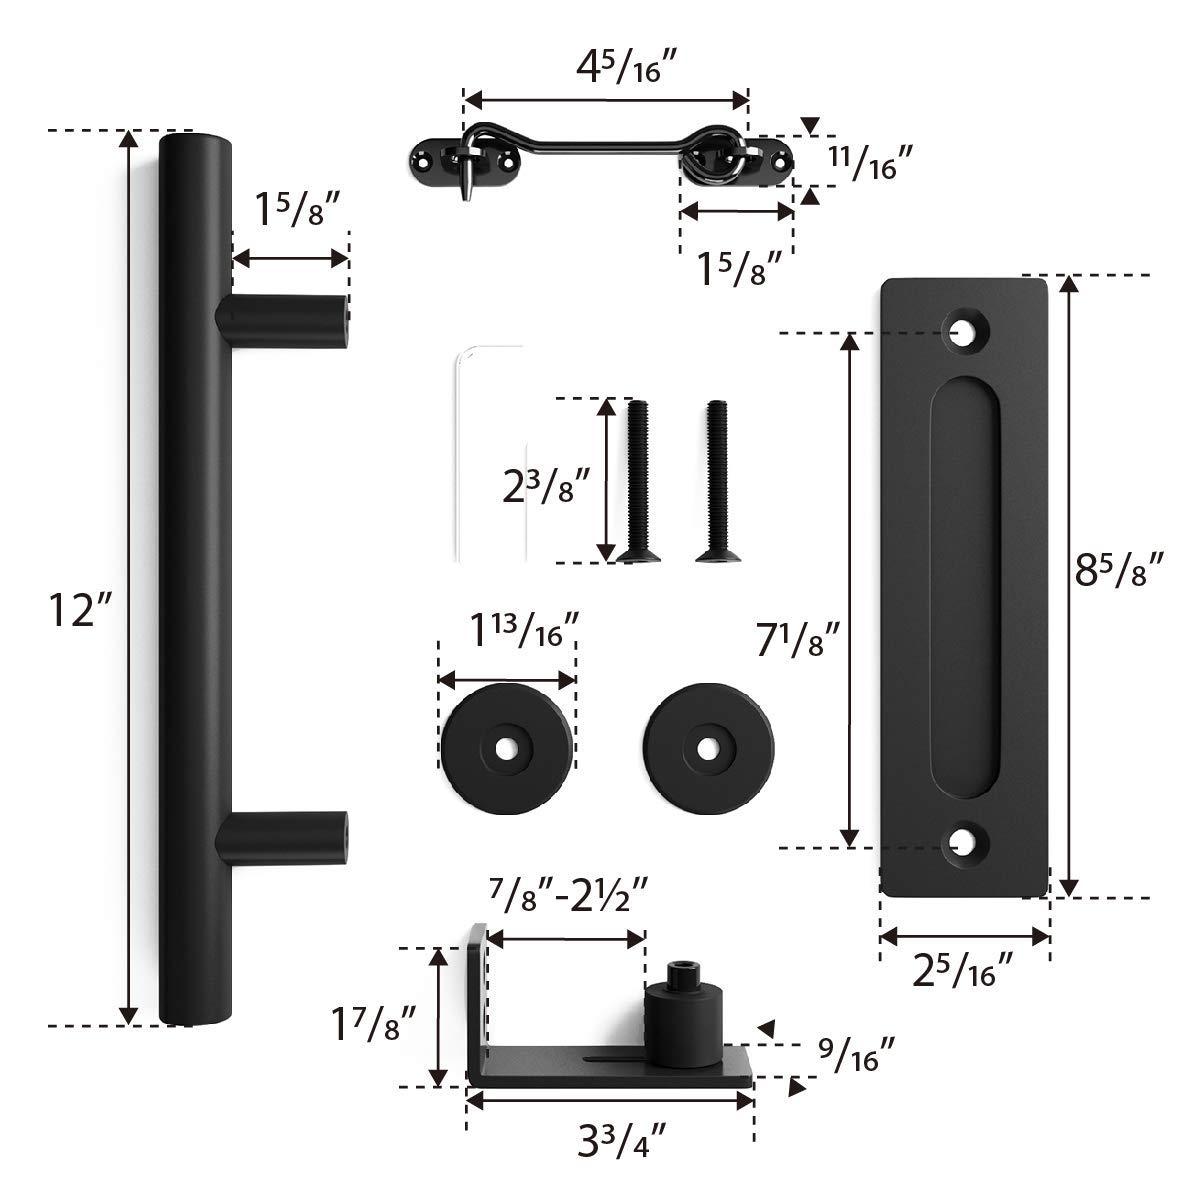 6.6 FT Heavy Duty Sturdy Sliding Barn Door Hardware Kit, 6.6ft Double Rail, Black, (Whole Set Includes 1x Pull Handle Set & 1x Floor Guide & 1x Latch Lock) Fit 36''-40'' Wide Door Panel (I Shape Hanger) by SMARTSTANDARD (Image #7)